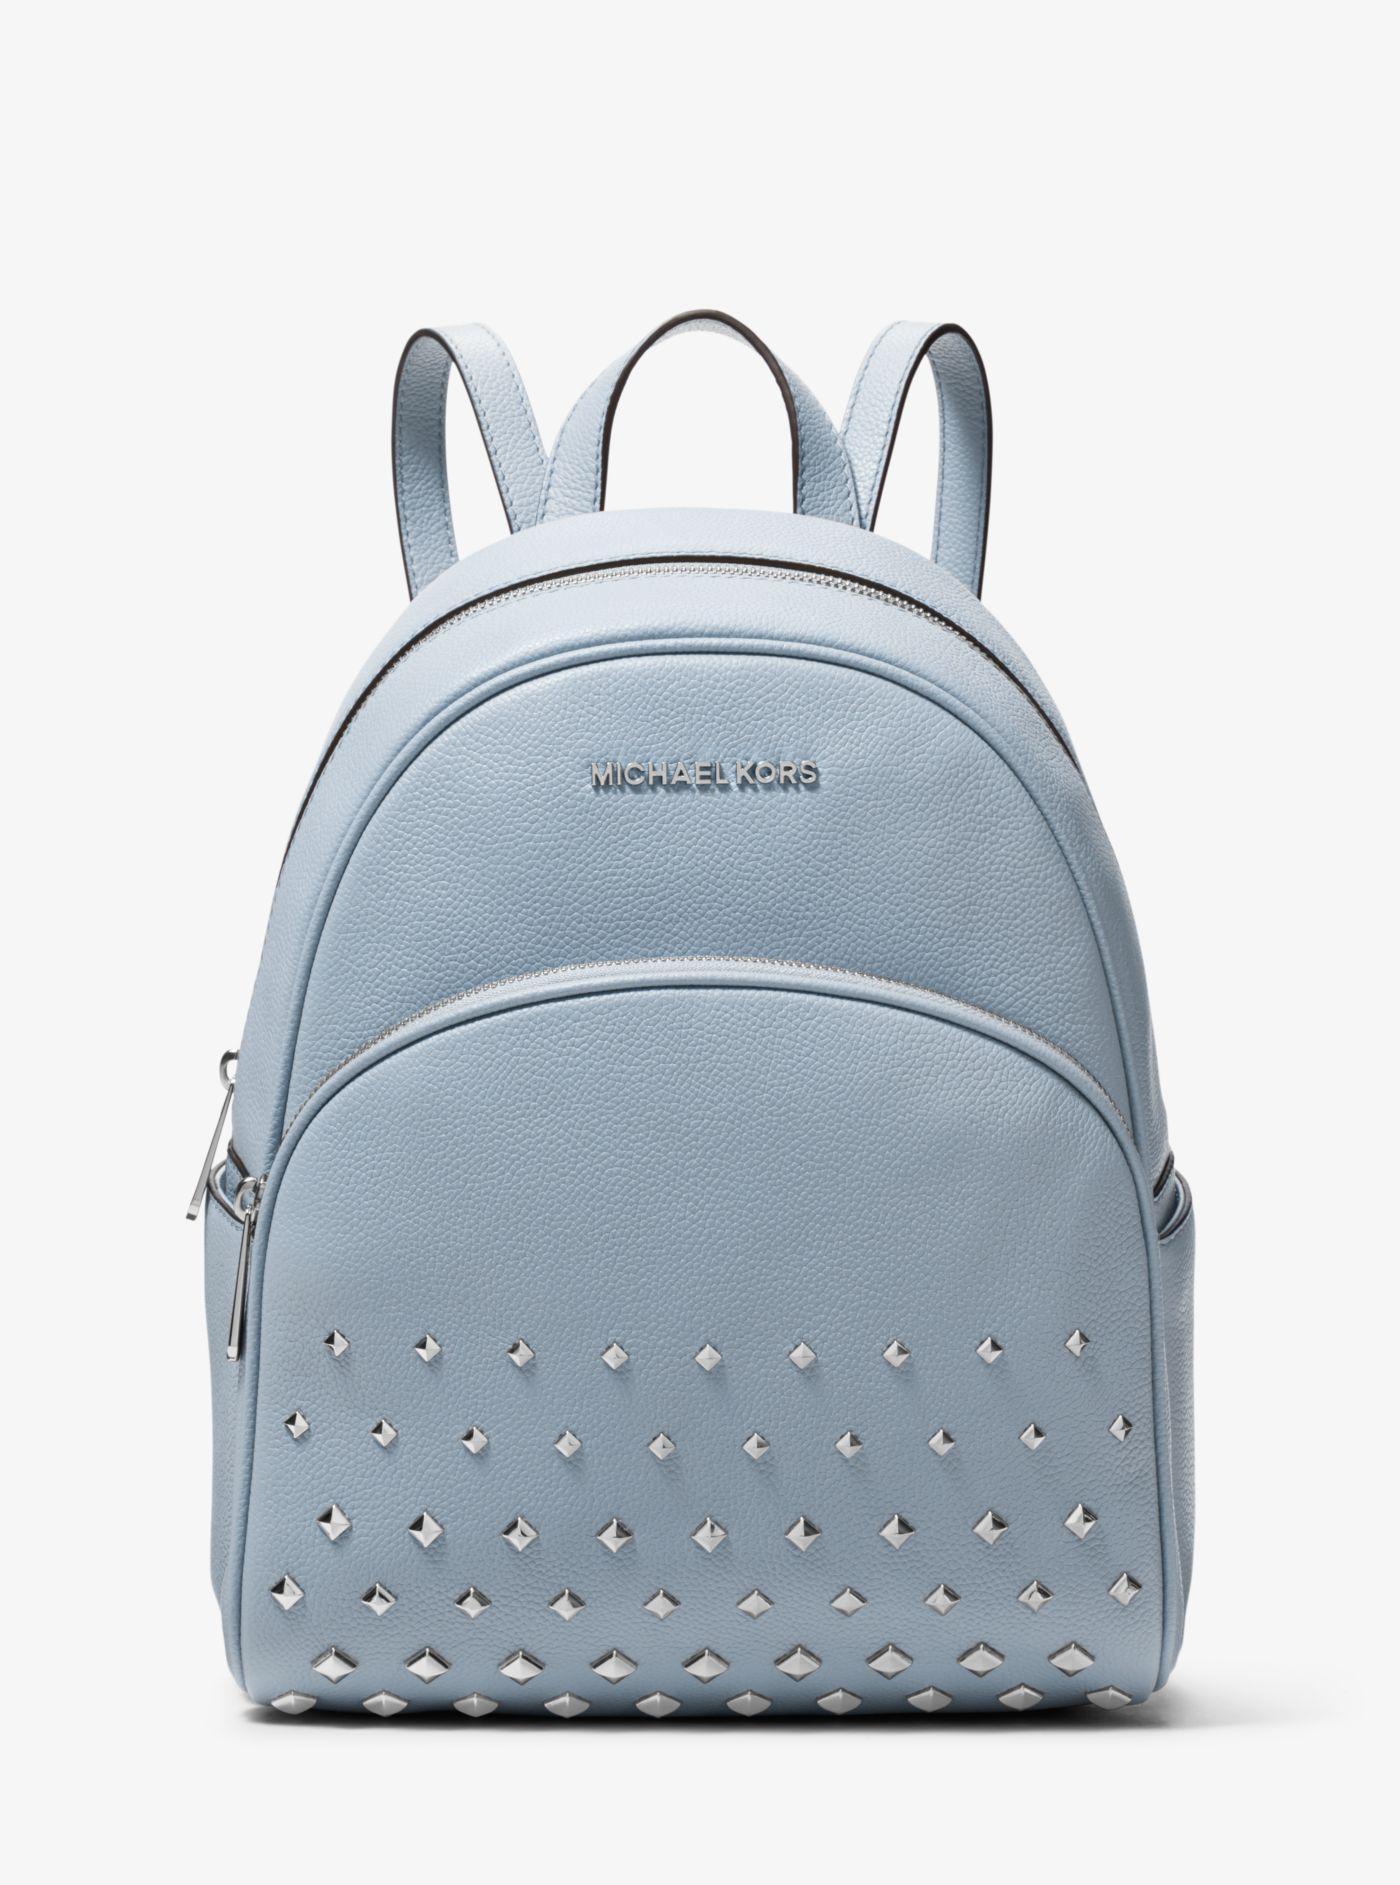 Michael Kors - Blue Abbey Medium Studded Pebbled Leather Backpack - Lyst.  View fullscreen ea7c3e22715e2